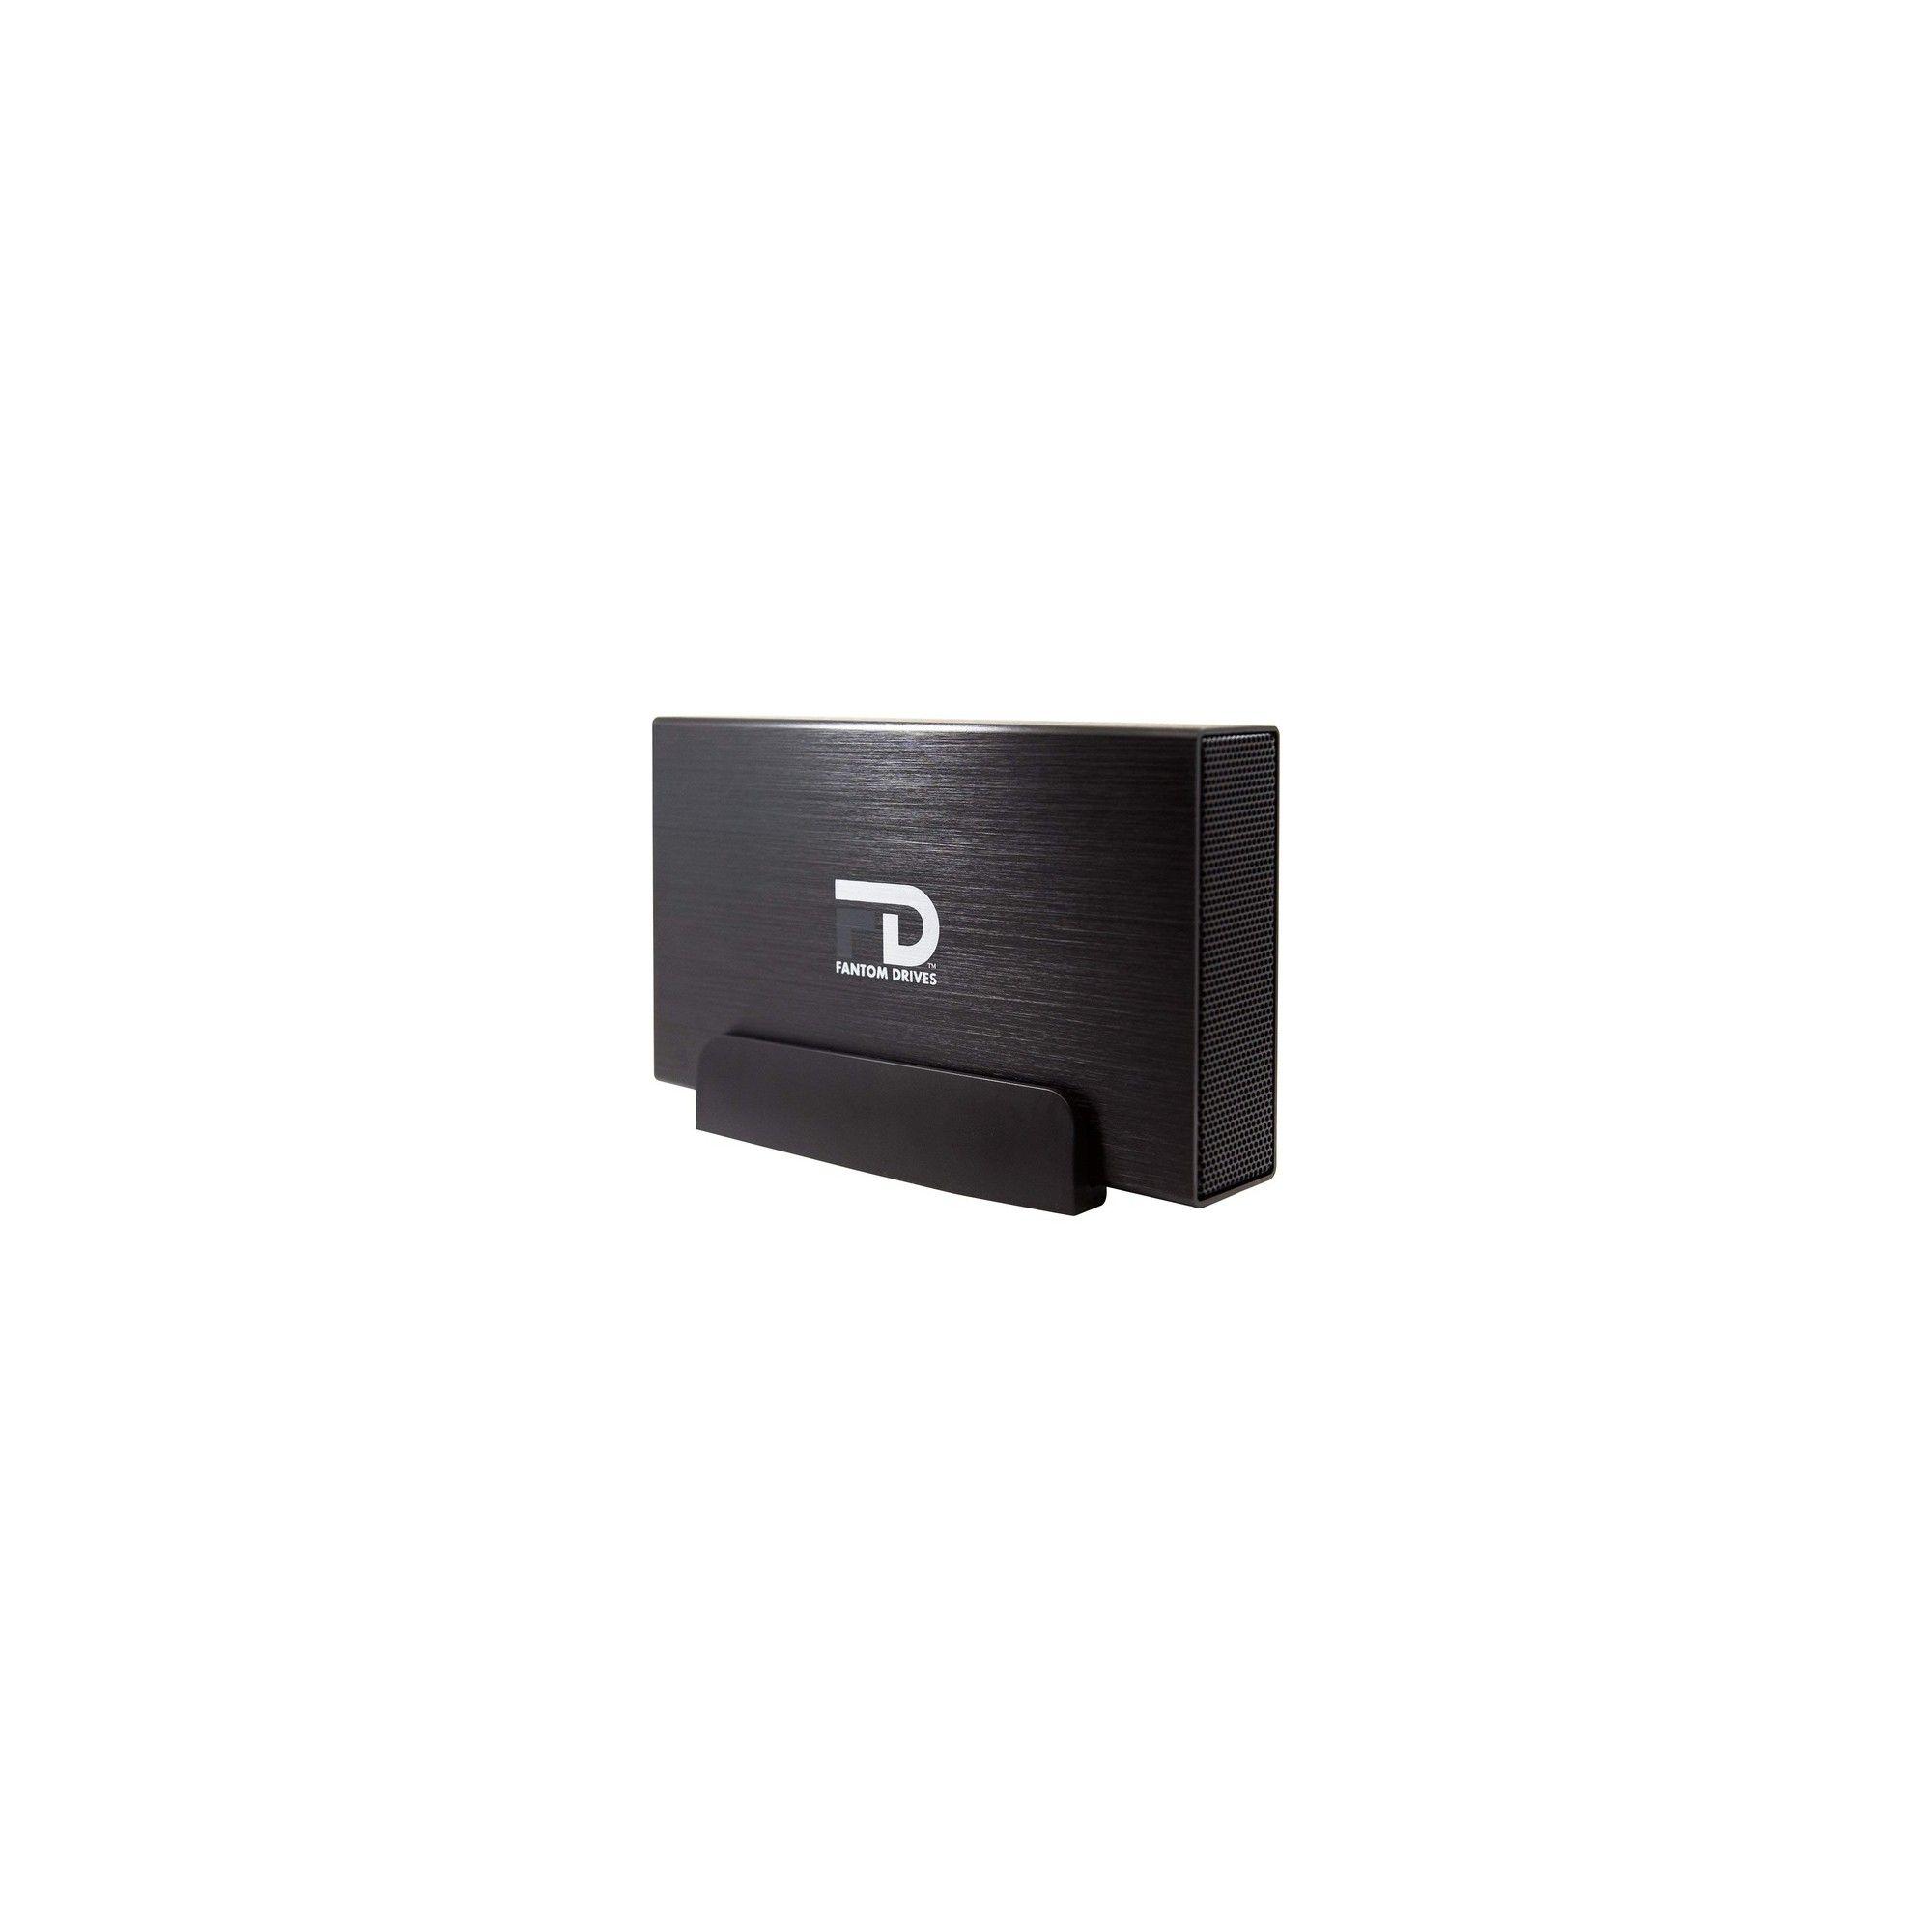 eSATA Aluminum External Hard Drive Fantom Drives 8TB Gforce3 USB 3.0